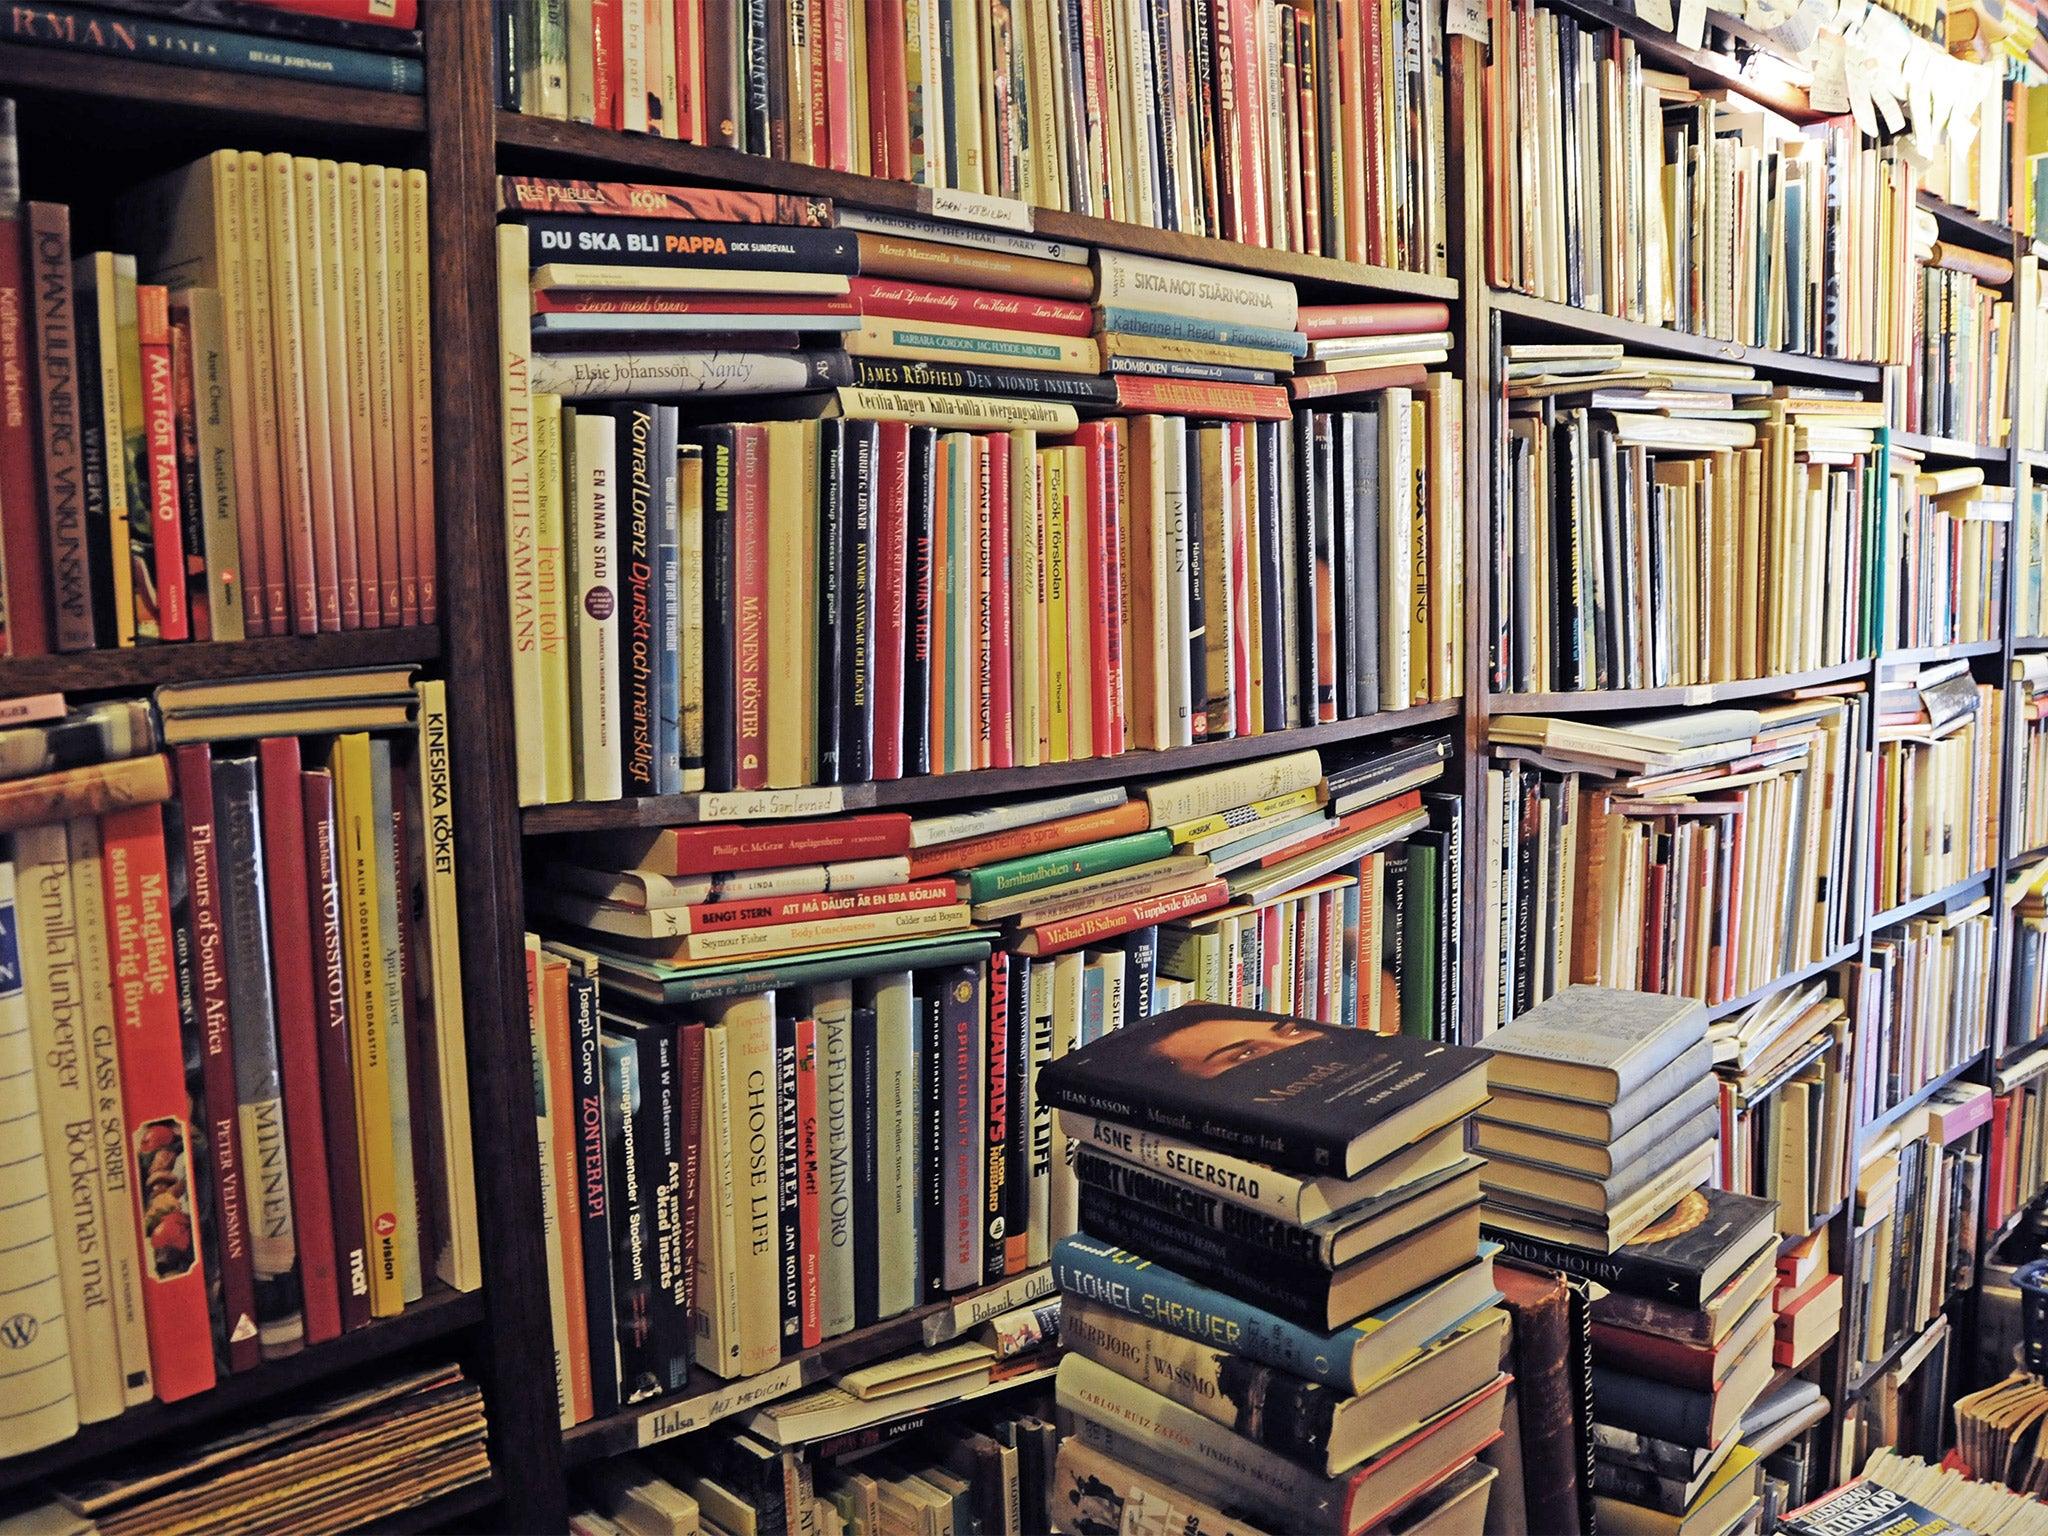 Sex novels to read online in Melbourne